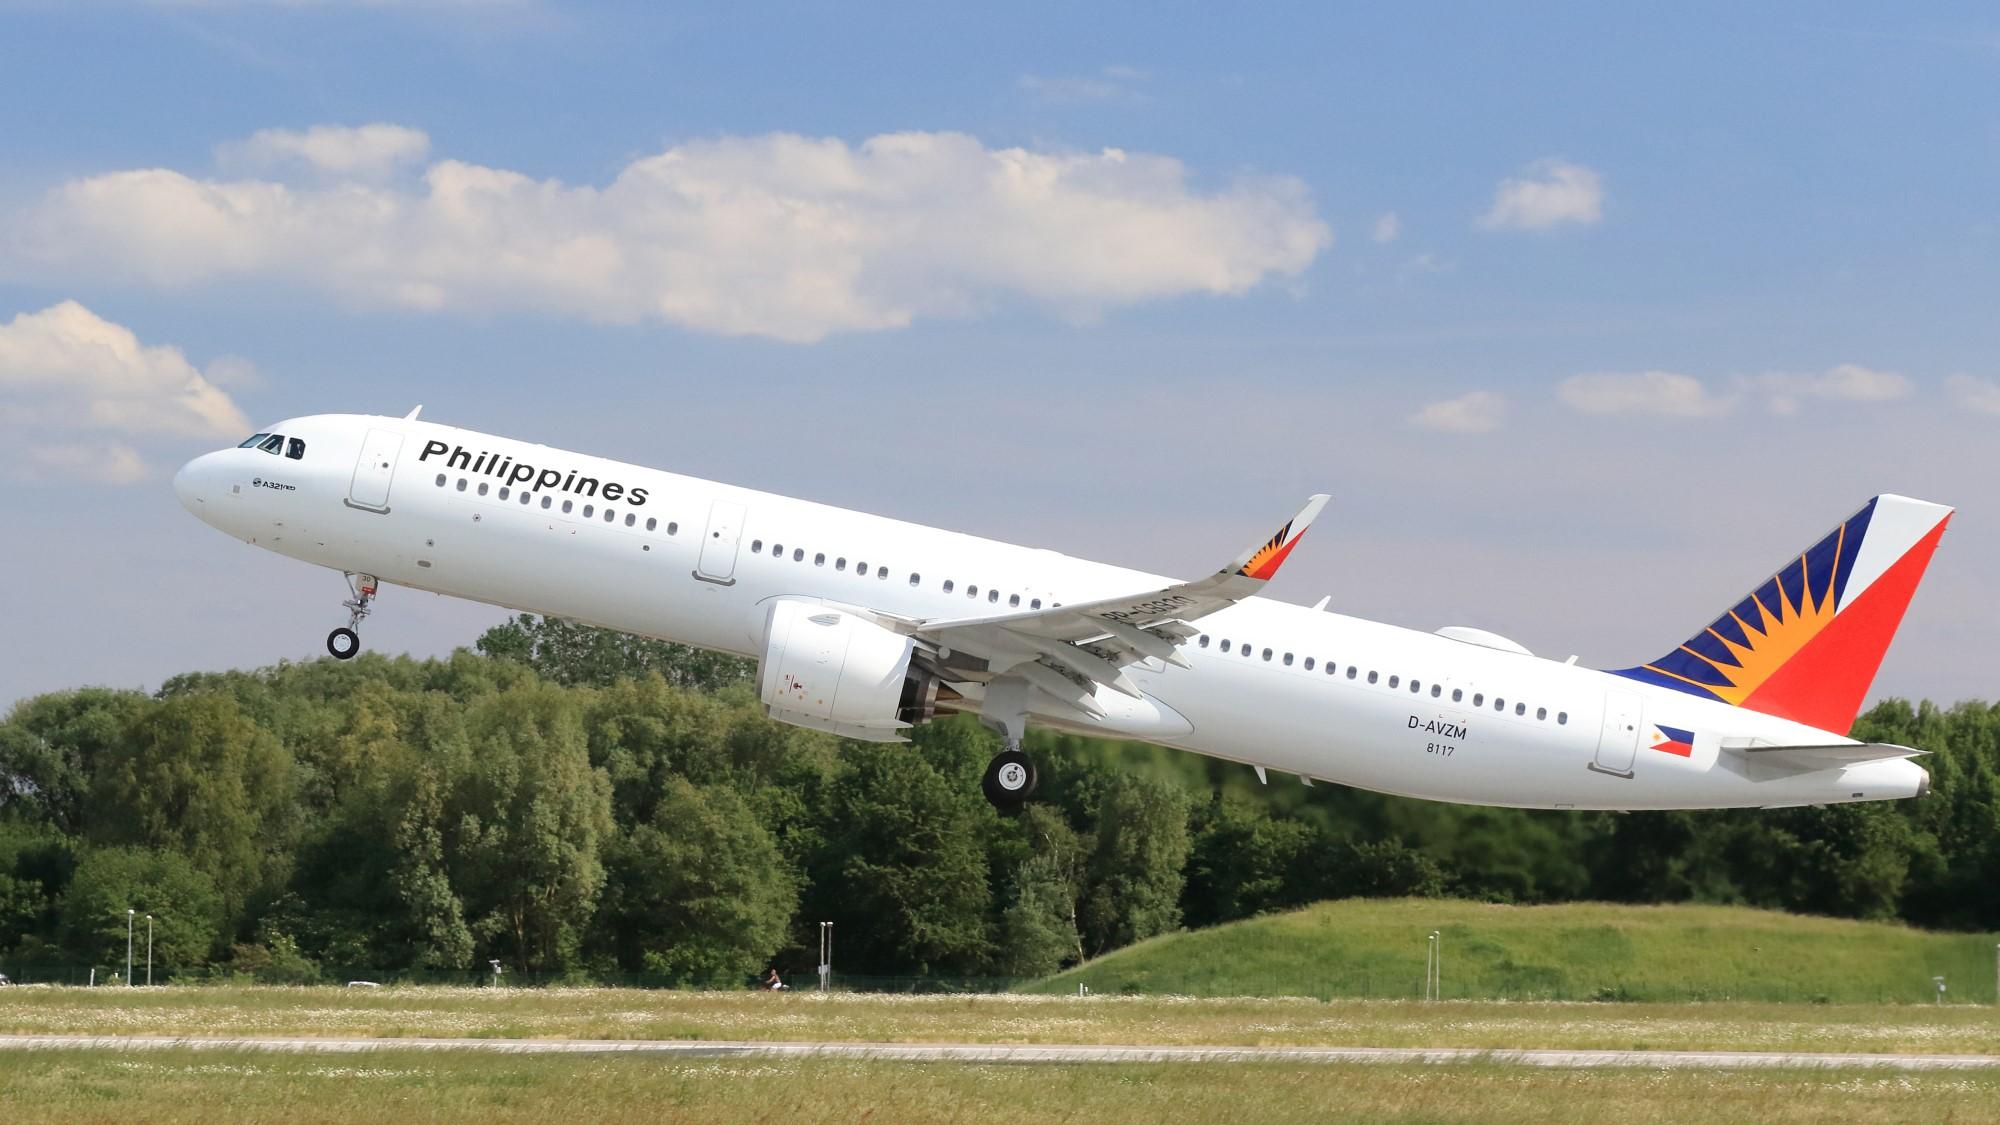 LOOK: Philippine Airlines gets 1st aircraft under fleet renewal program